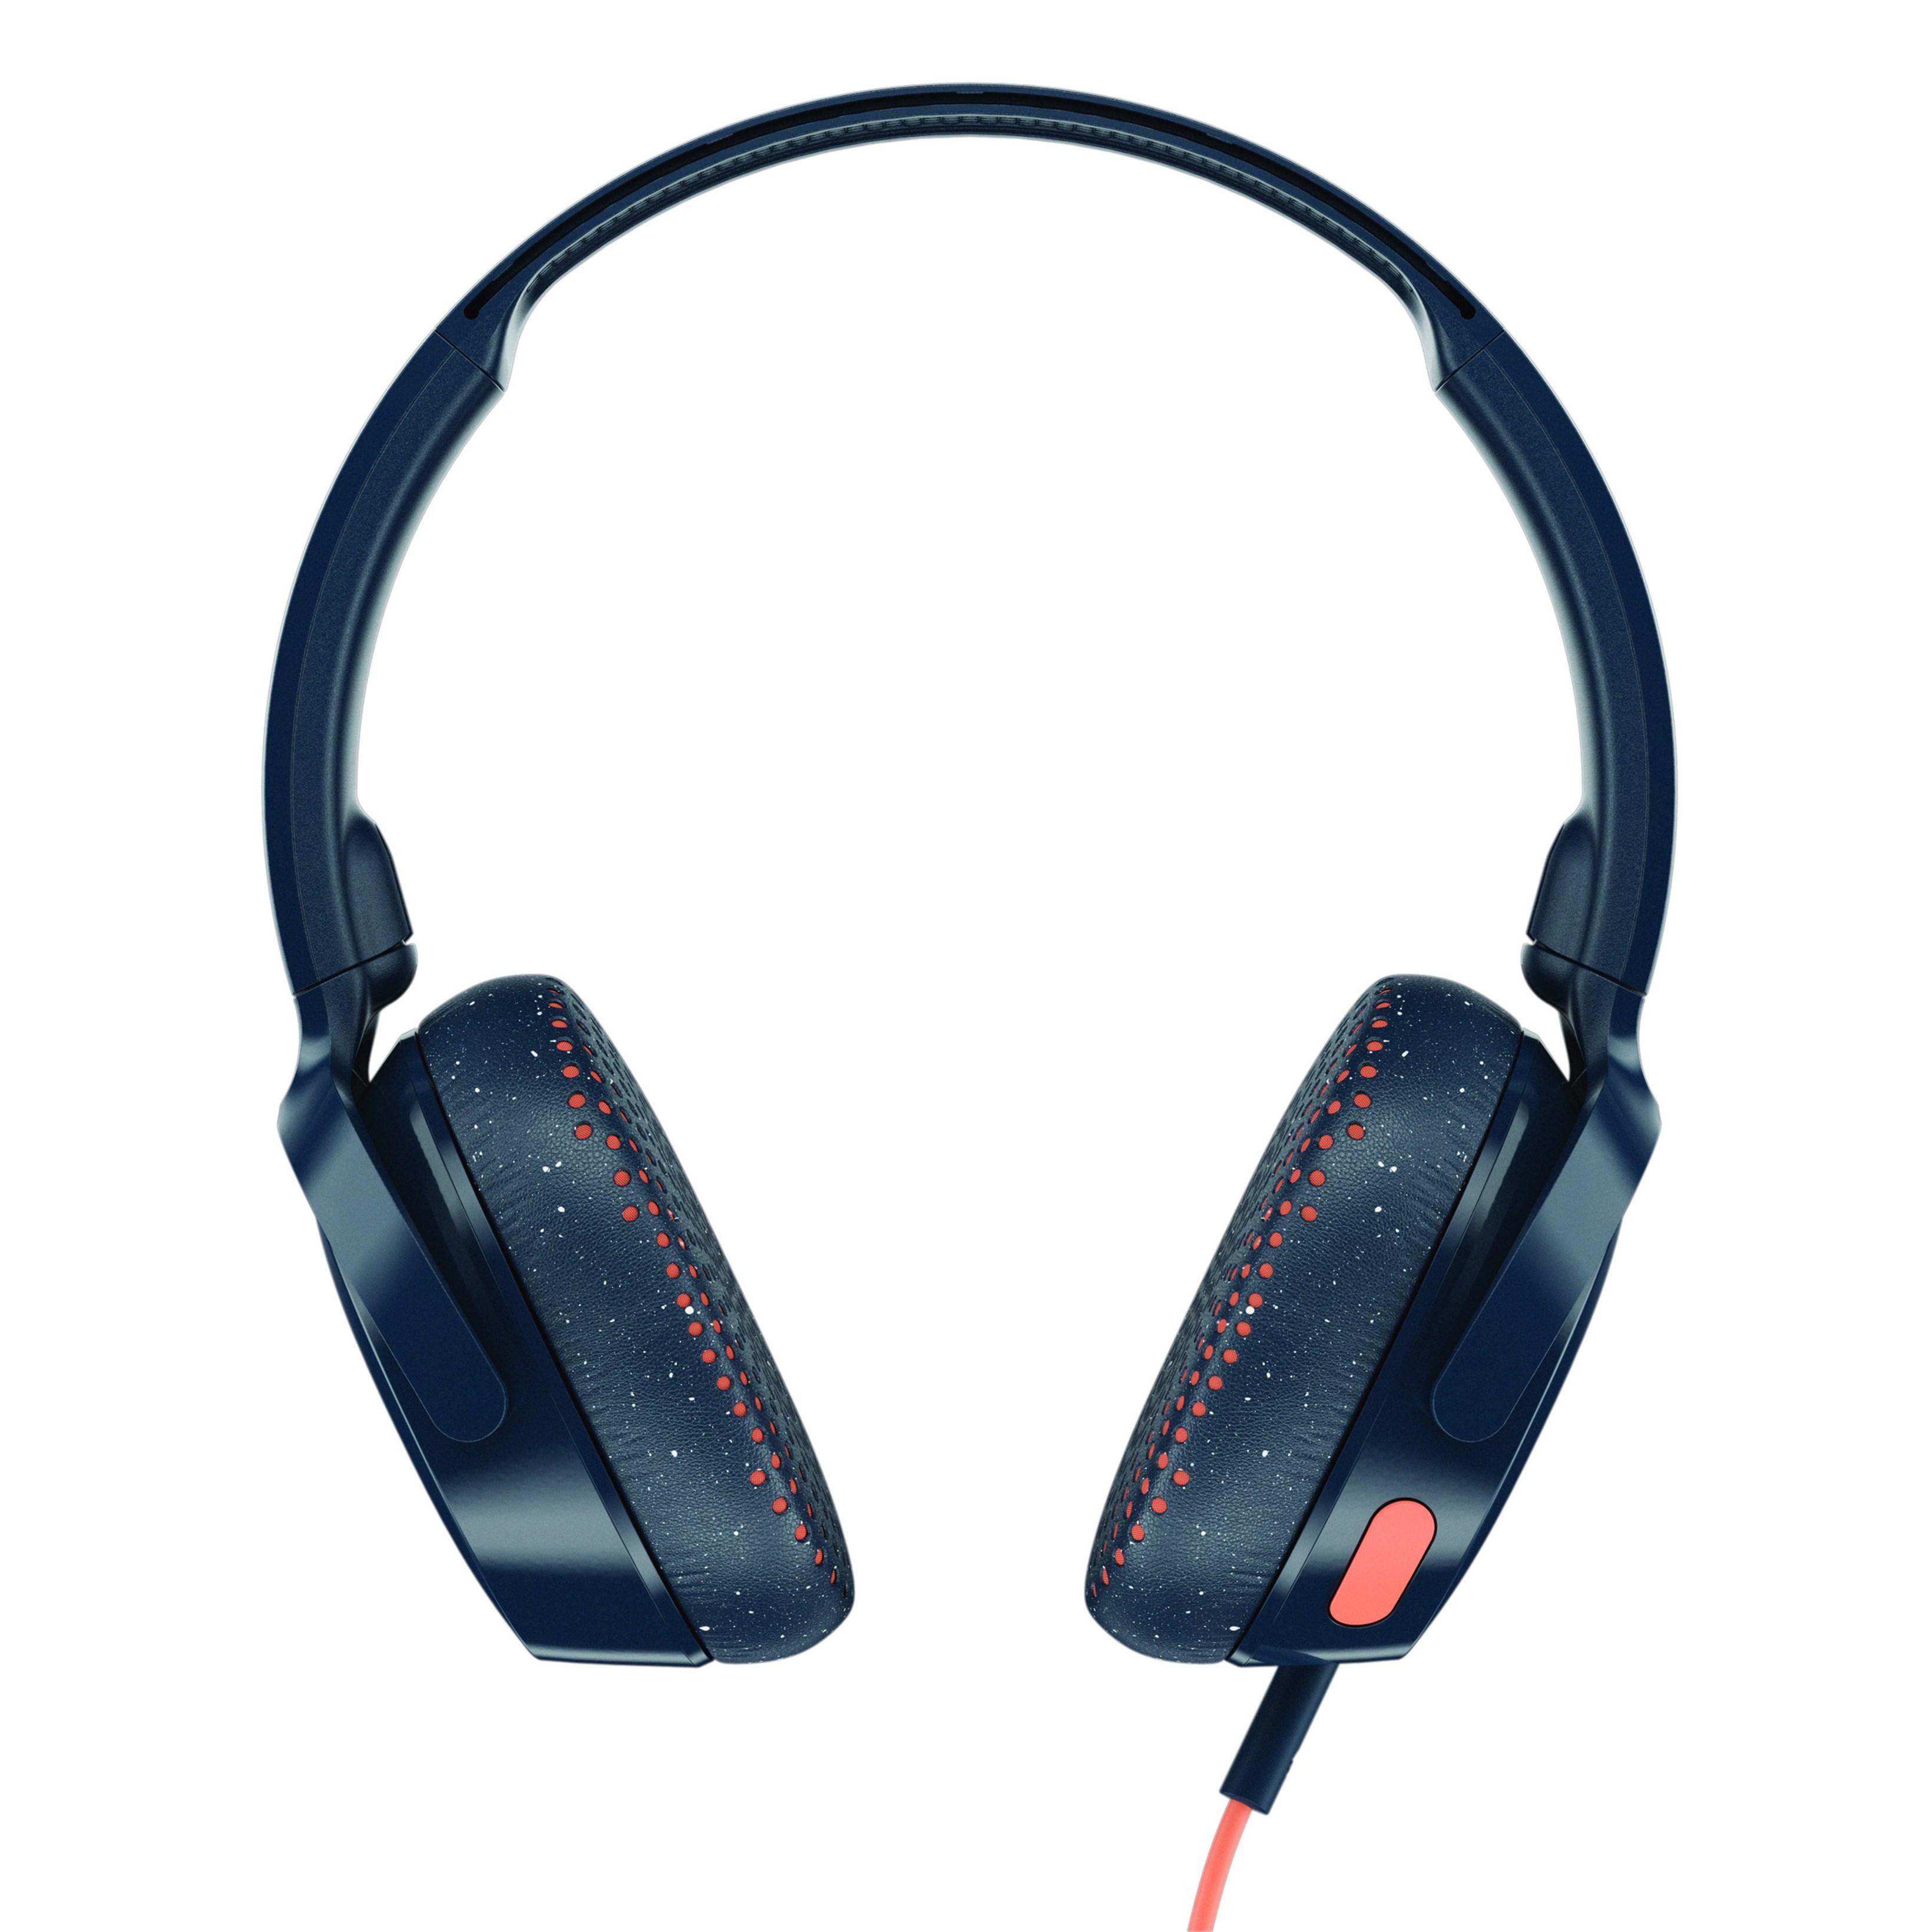 Skullcandy Riff Blue/Speckle/Sunset Headphones - 1